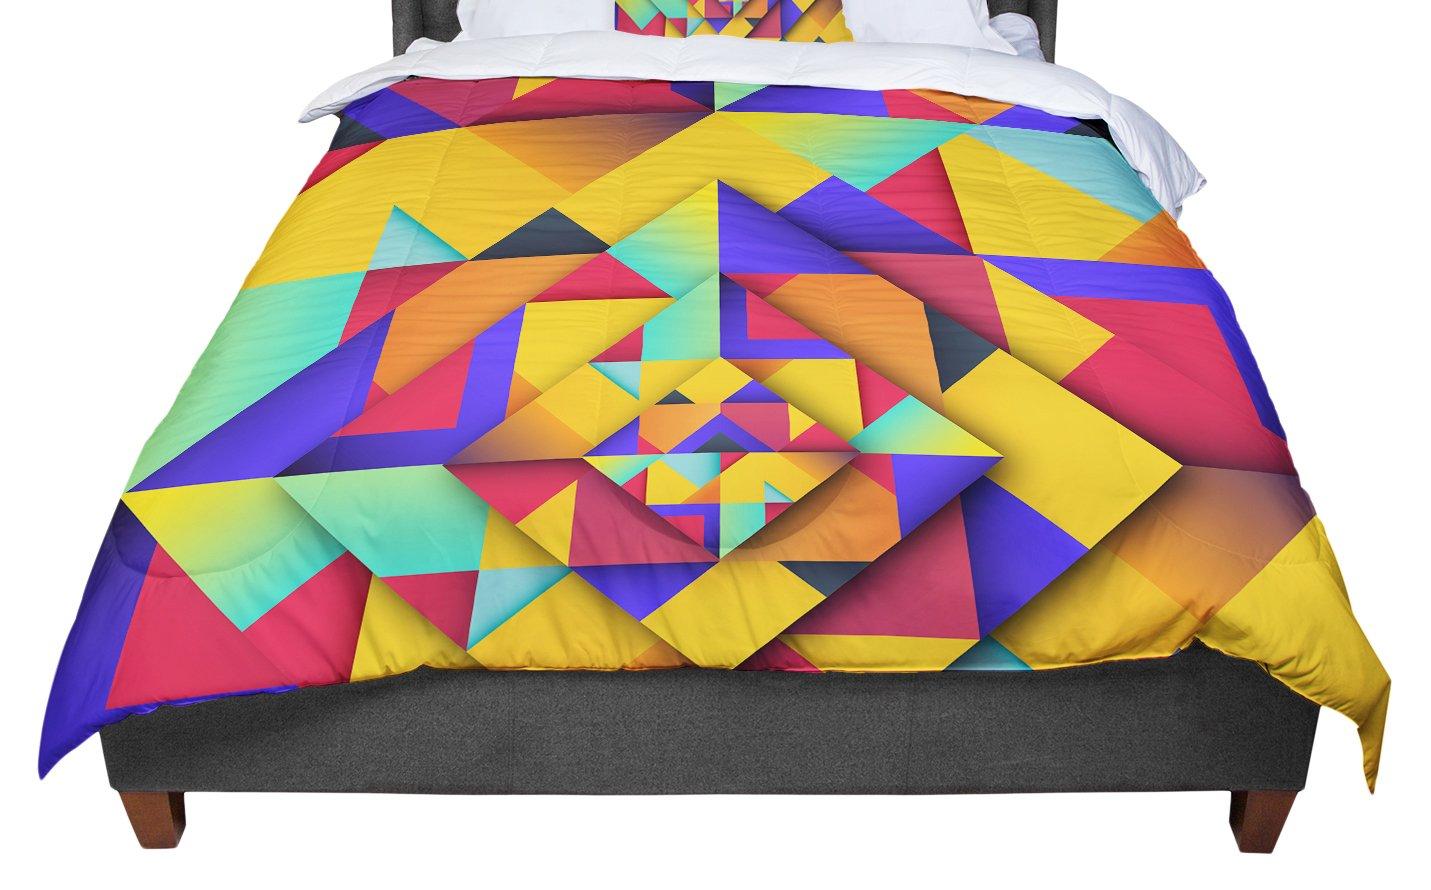 KESS InHouse Danny Ivan 'Shapes II' Geometric King / Cal King Comforter, 104' X 88'